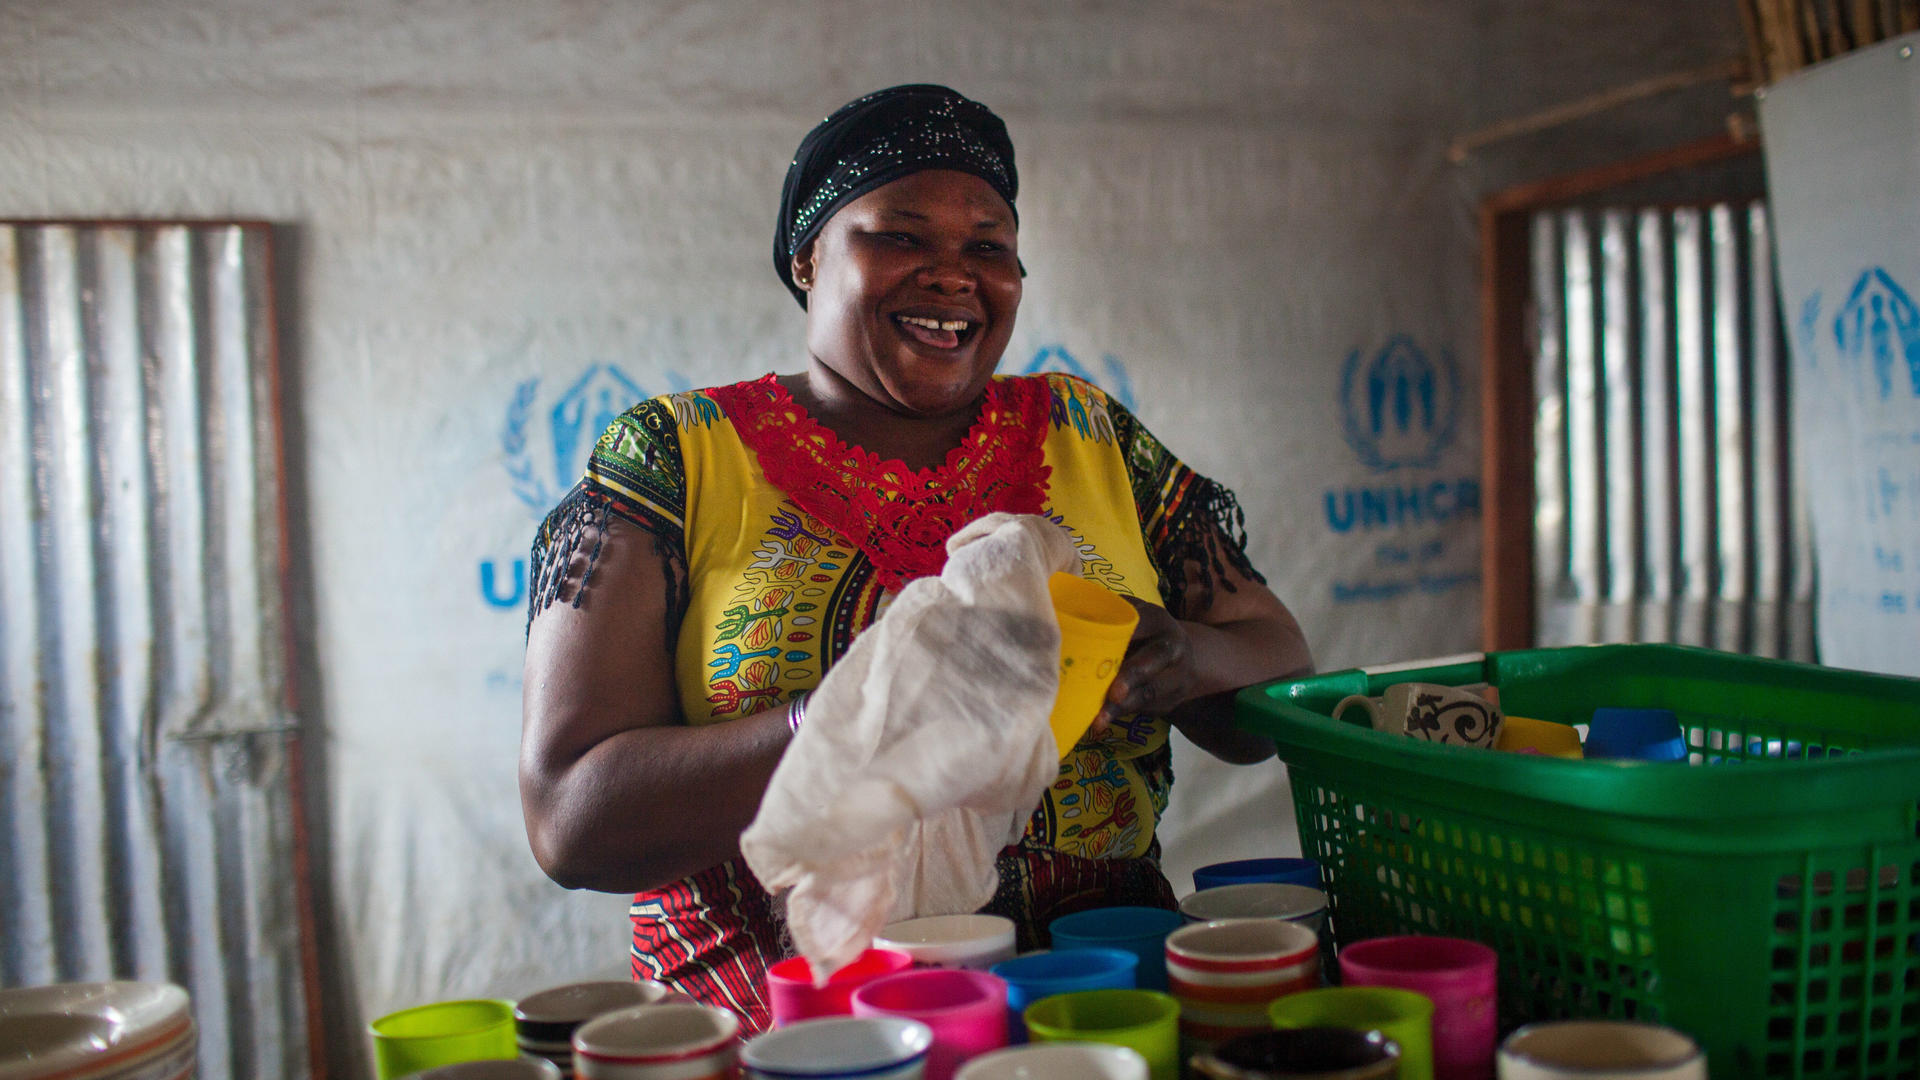 Zulu Likichio dries dishes at her restaurant in Bidi Bidi, Uganda